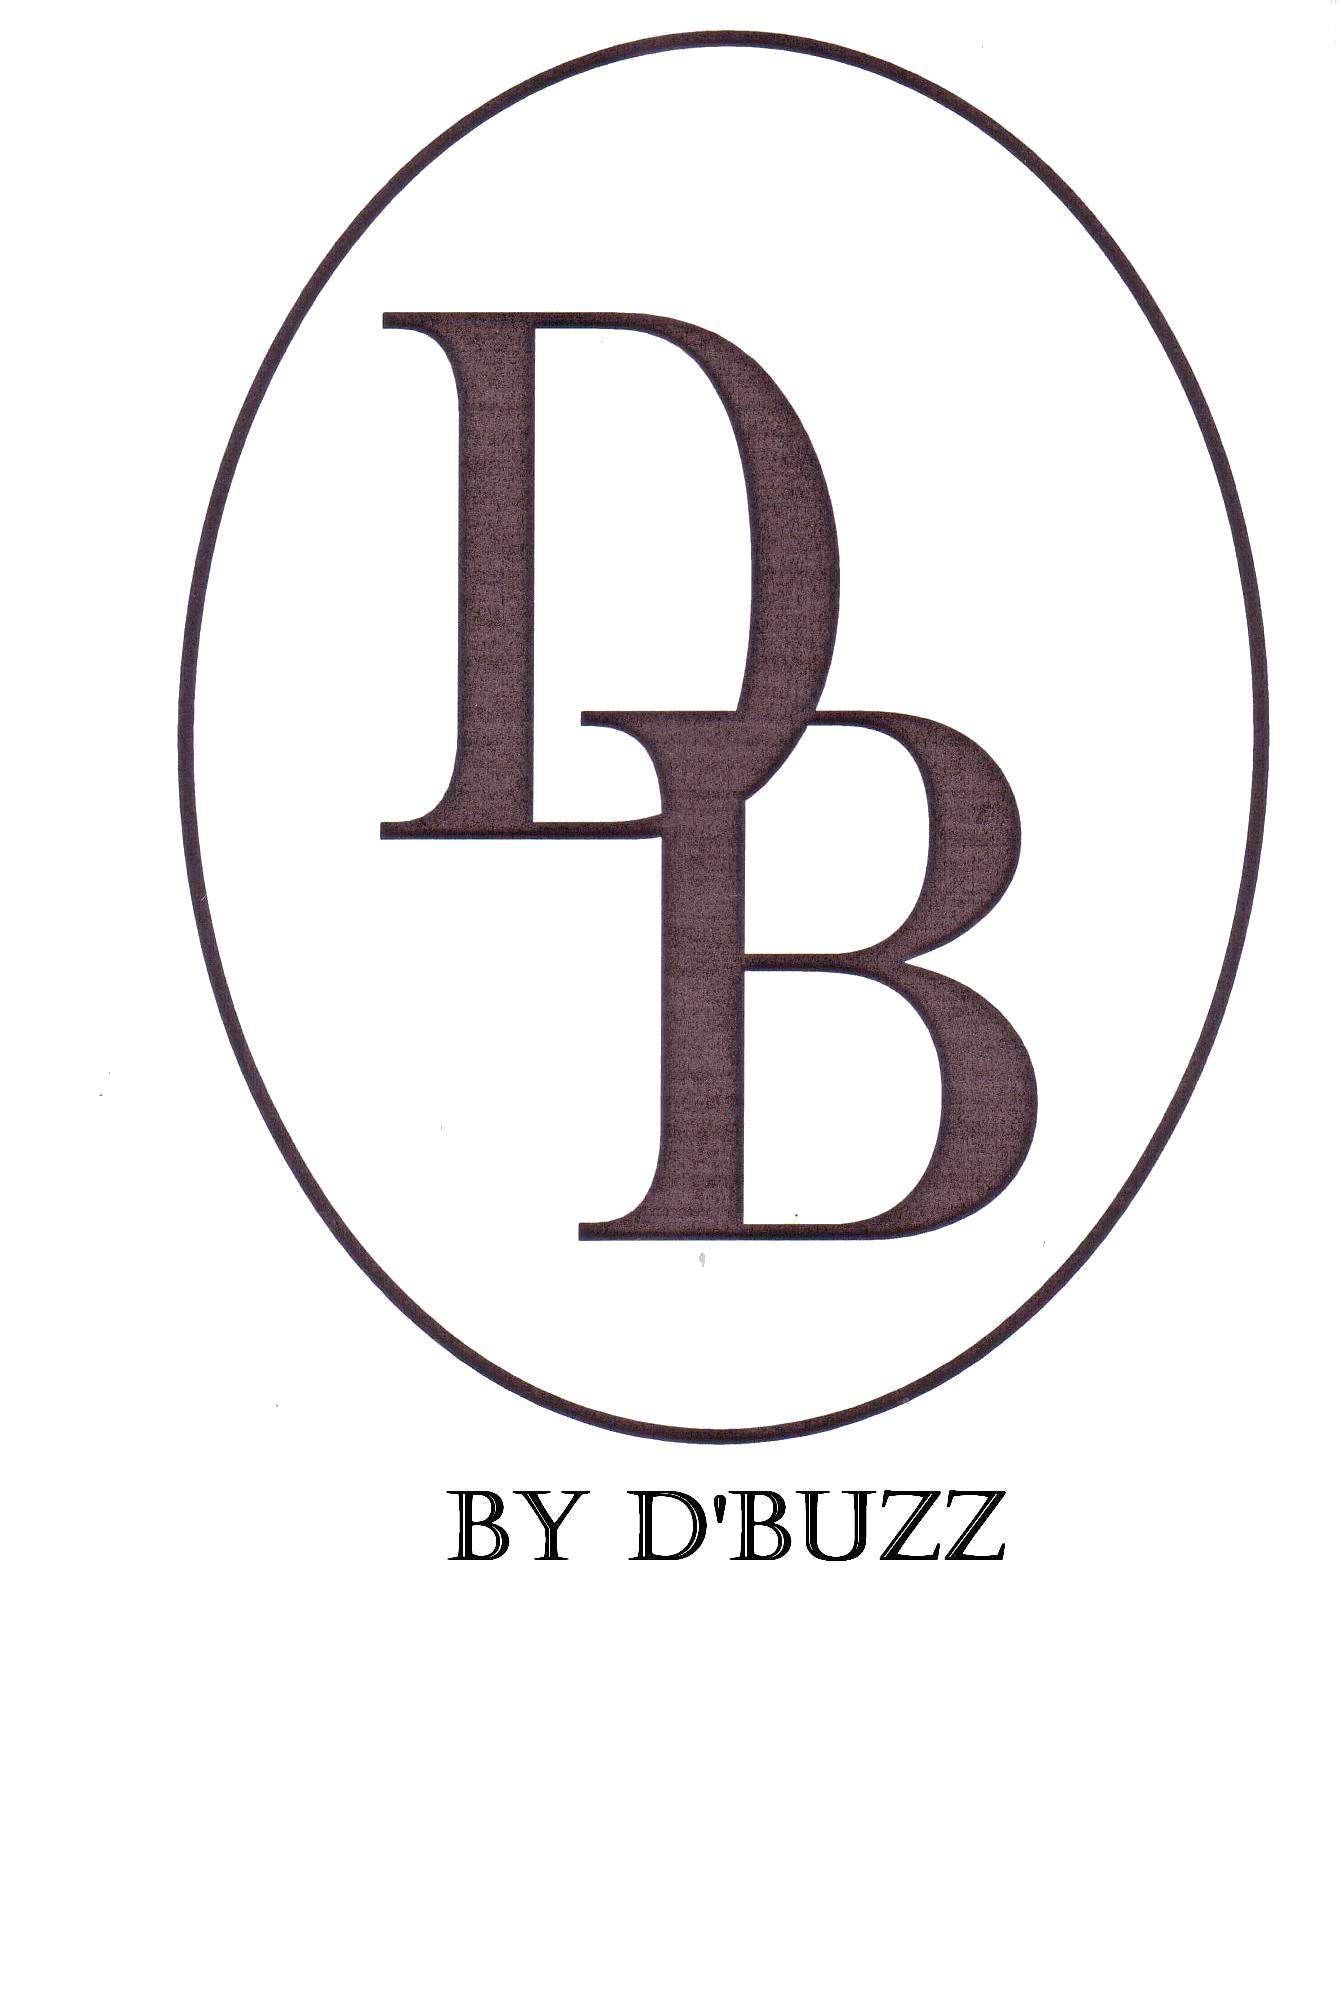 D'BUZZ